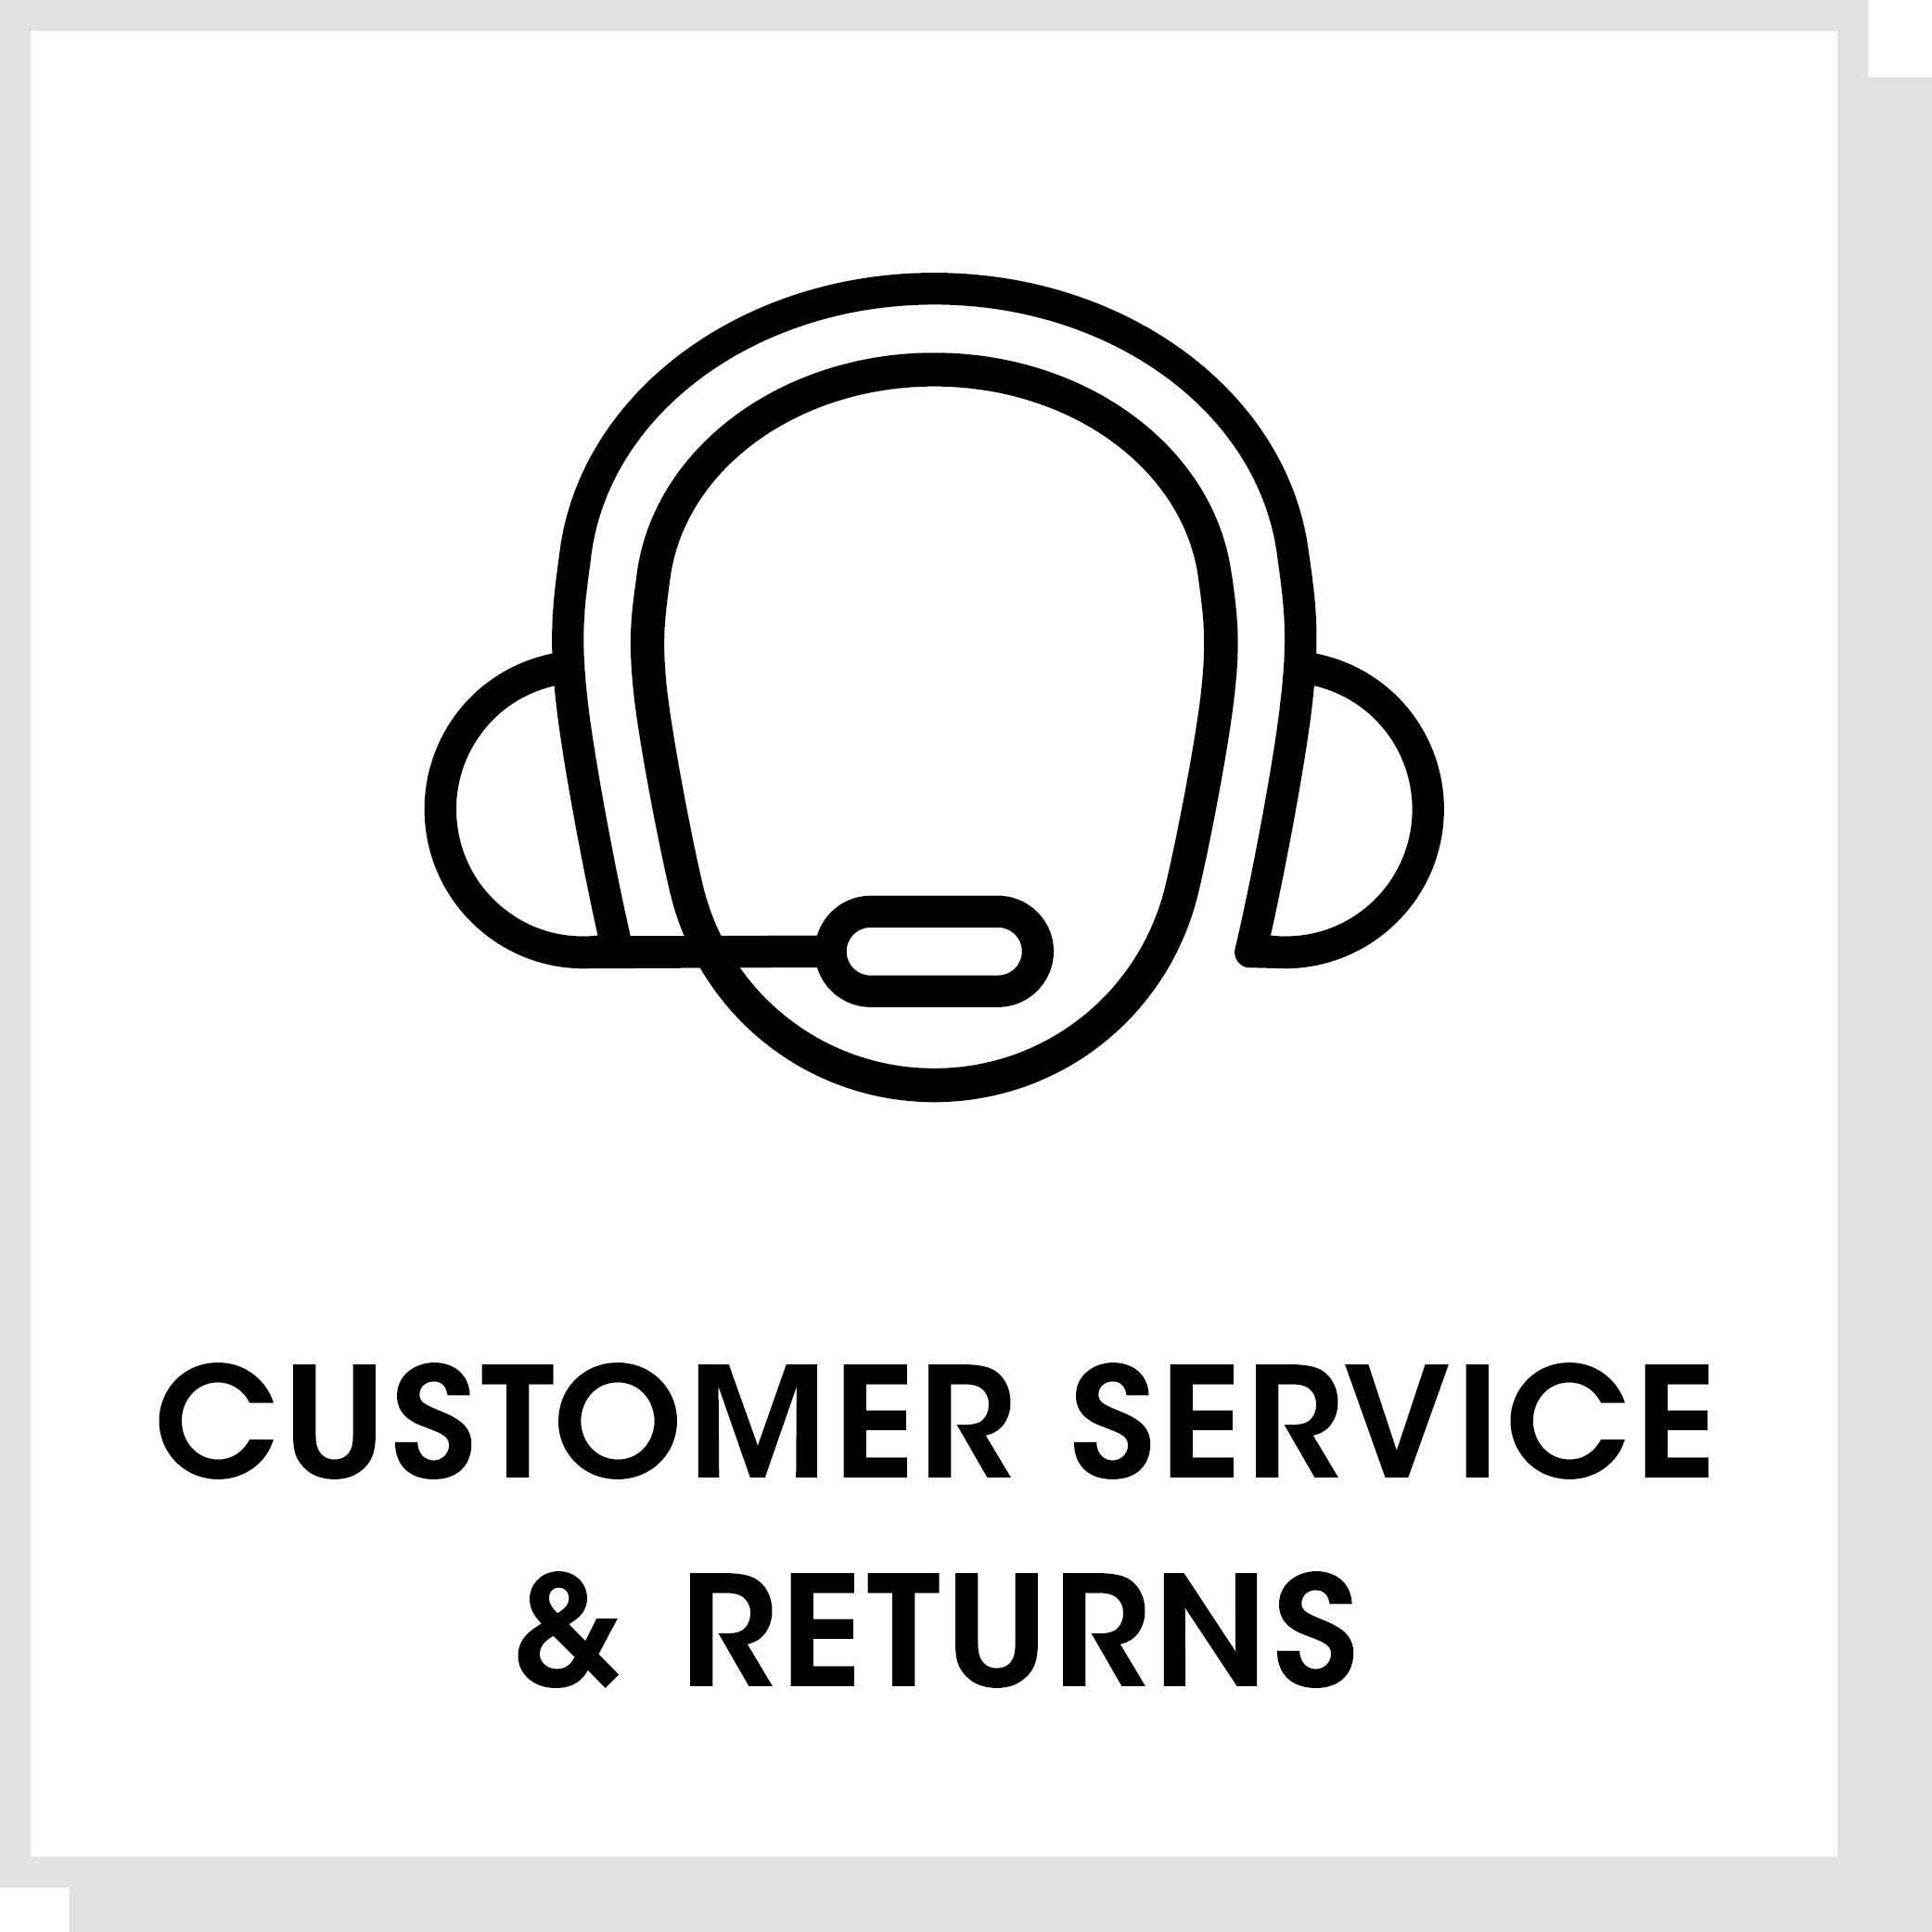 Customer Service & Returns